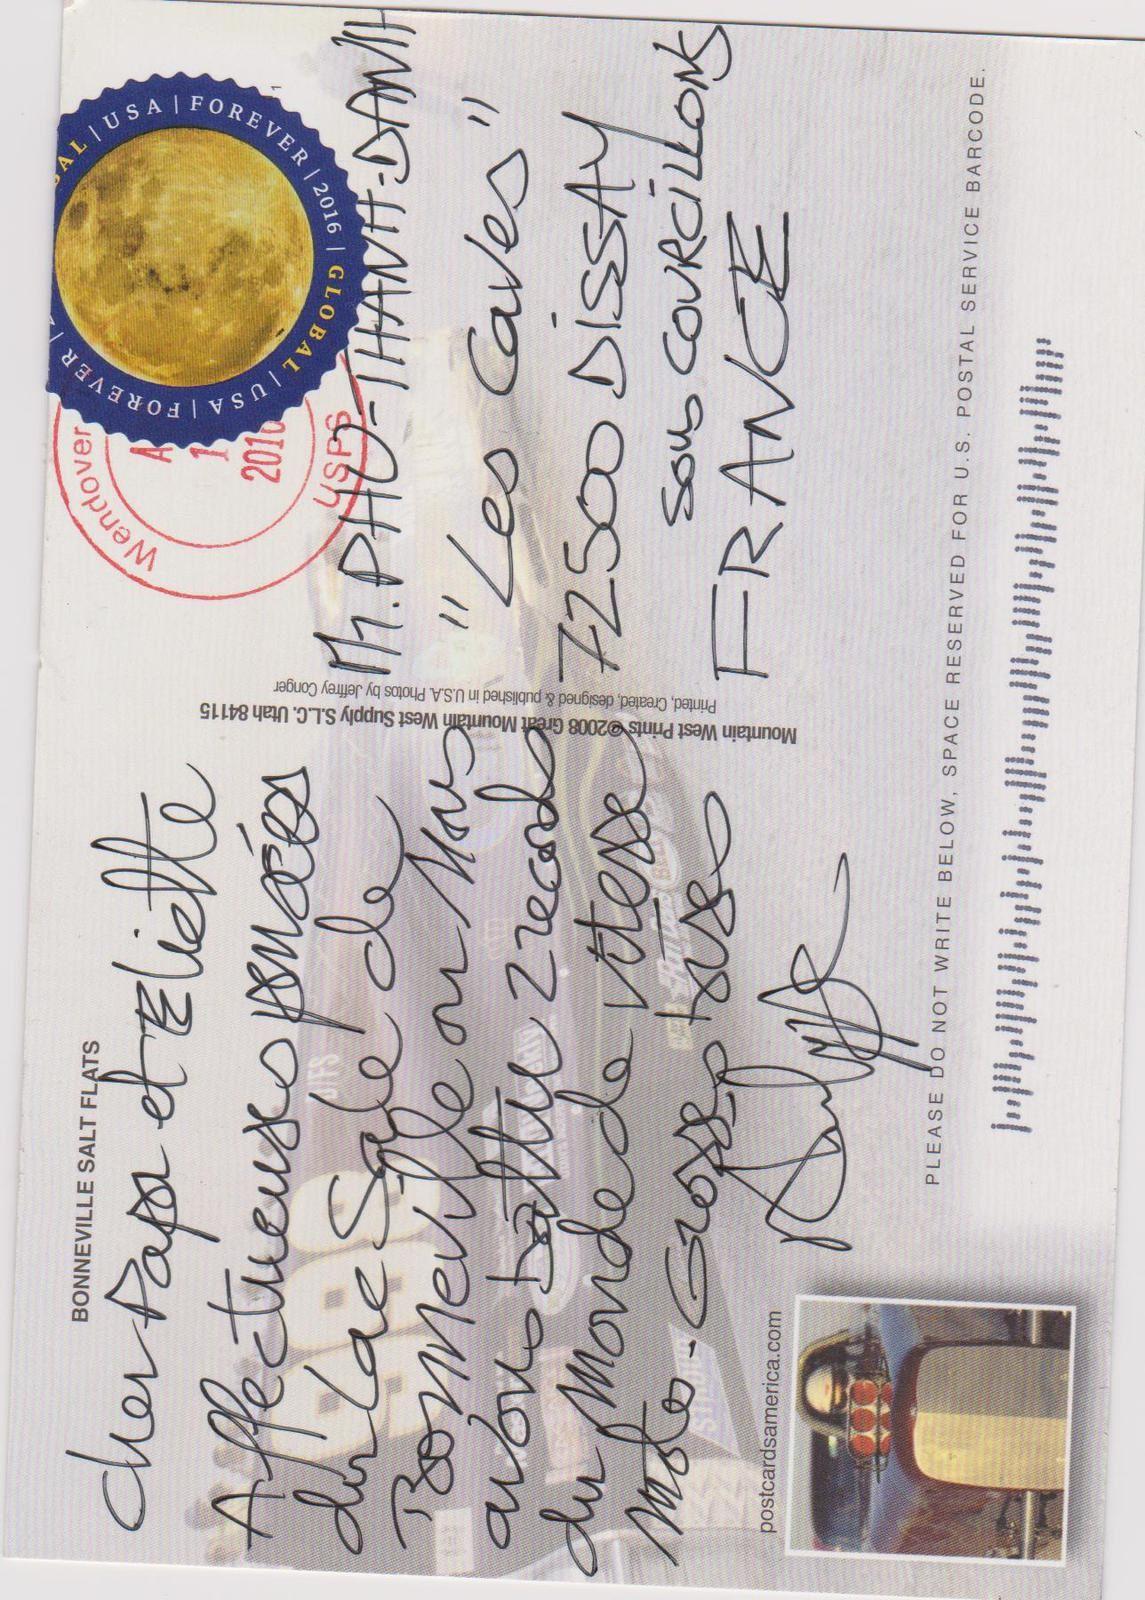 J'ai reçu ajourd'hui une jolie carte postale...